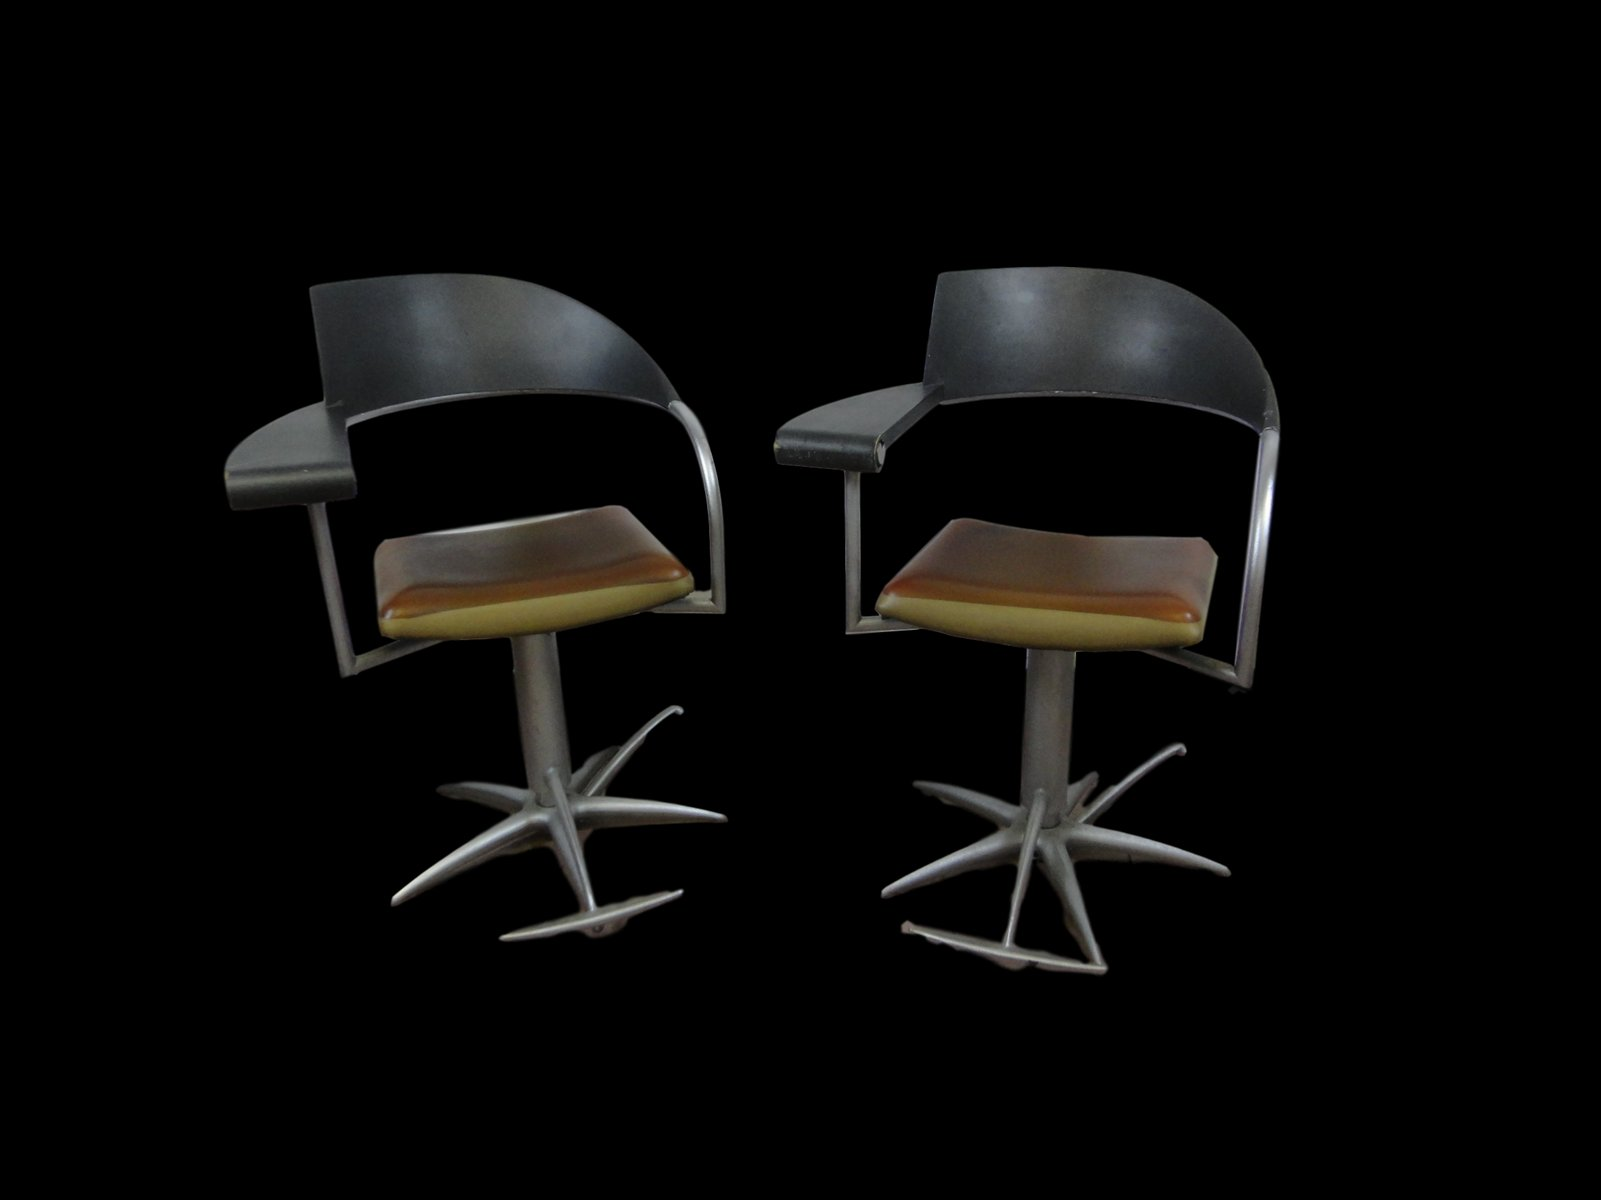 Sedie vintage da barbiere di Philippe Starck per Tecno, anni \'90 ...